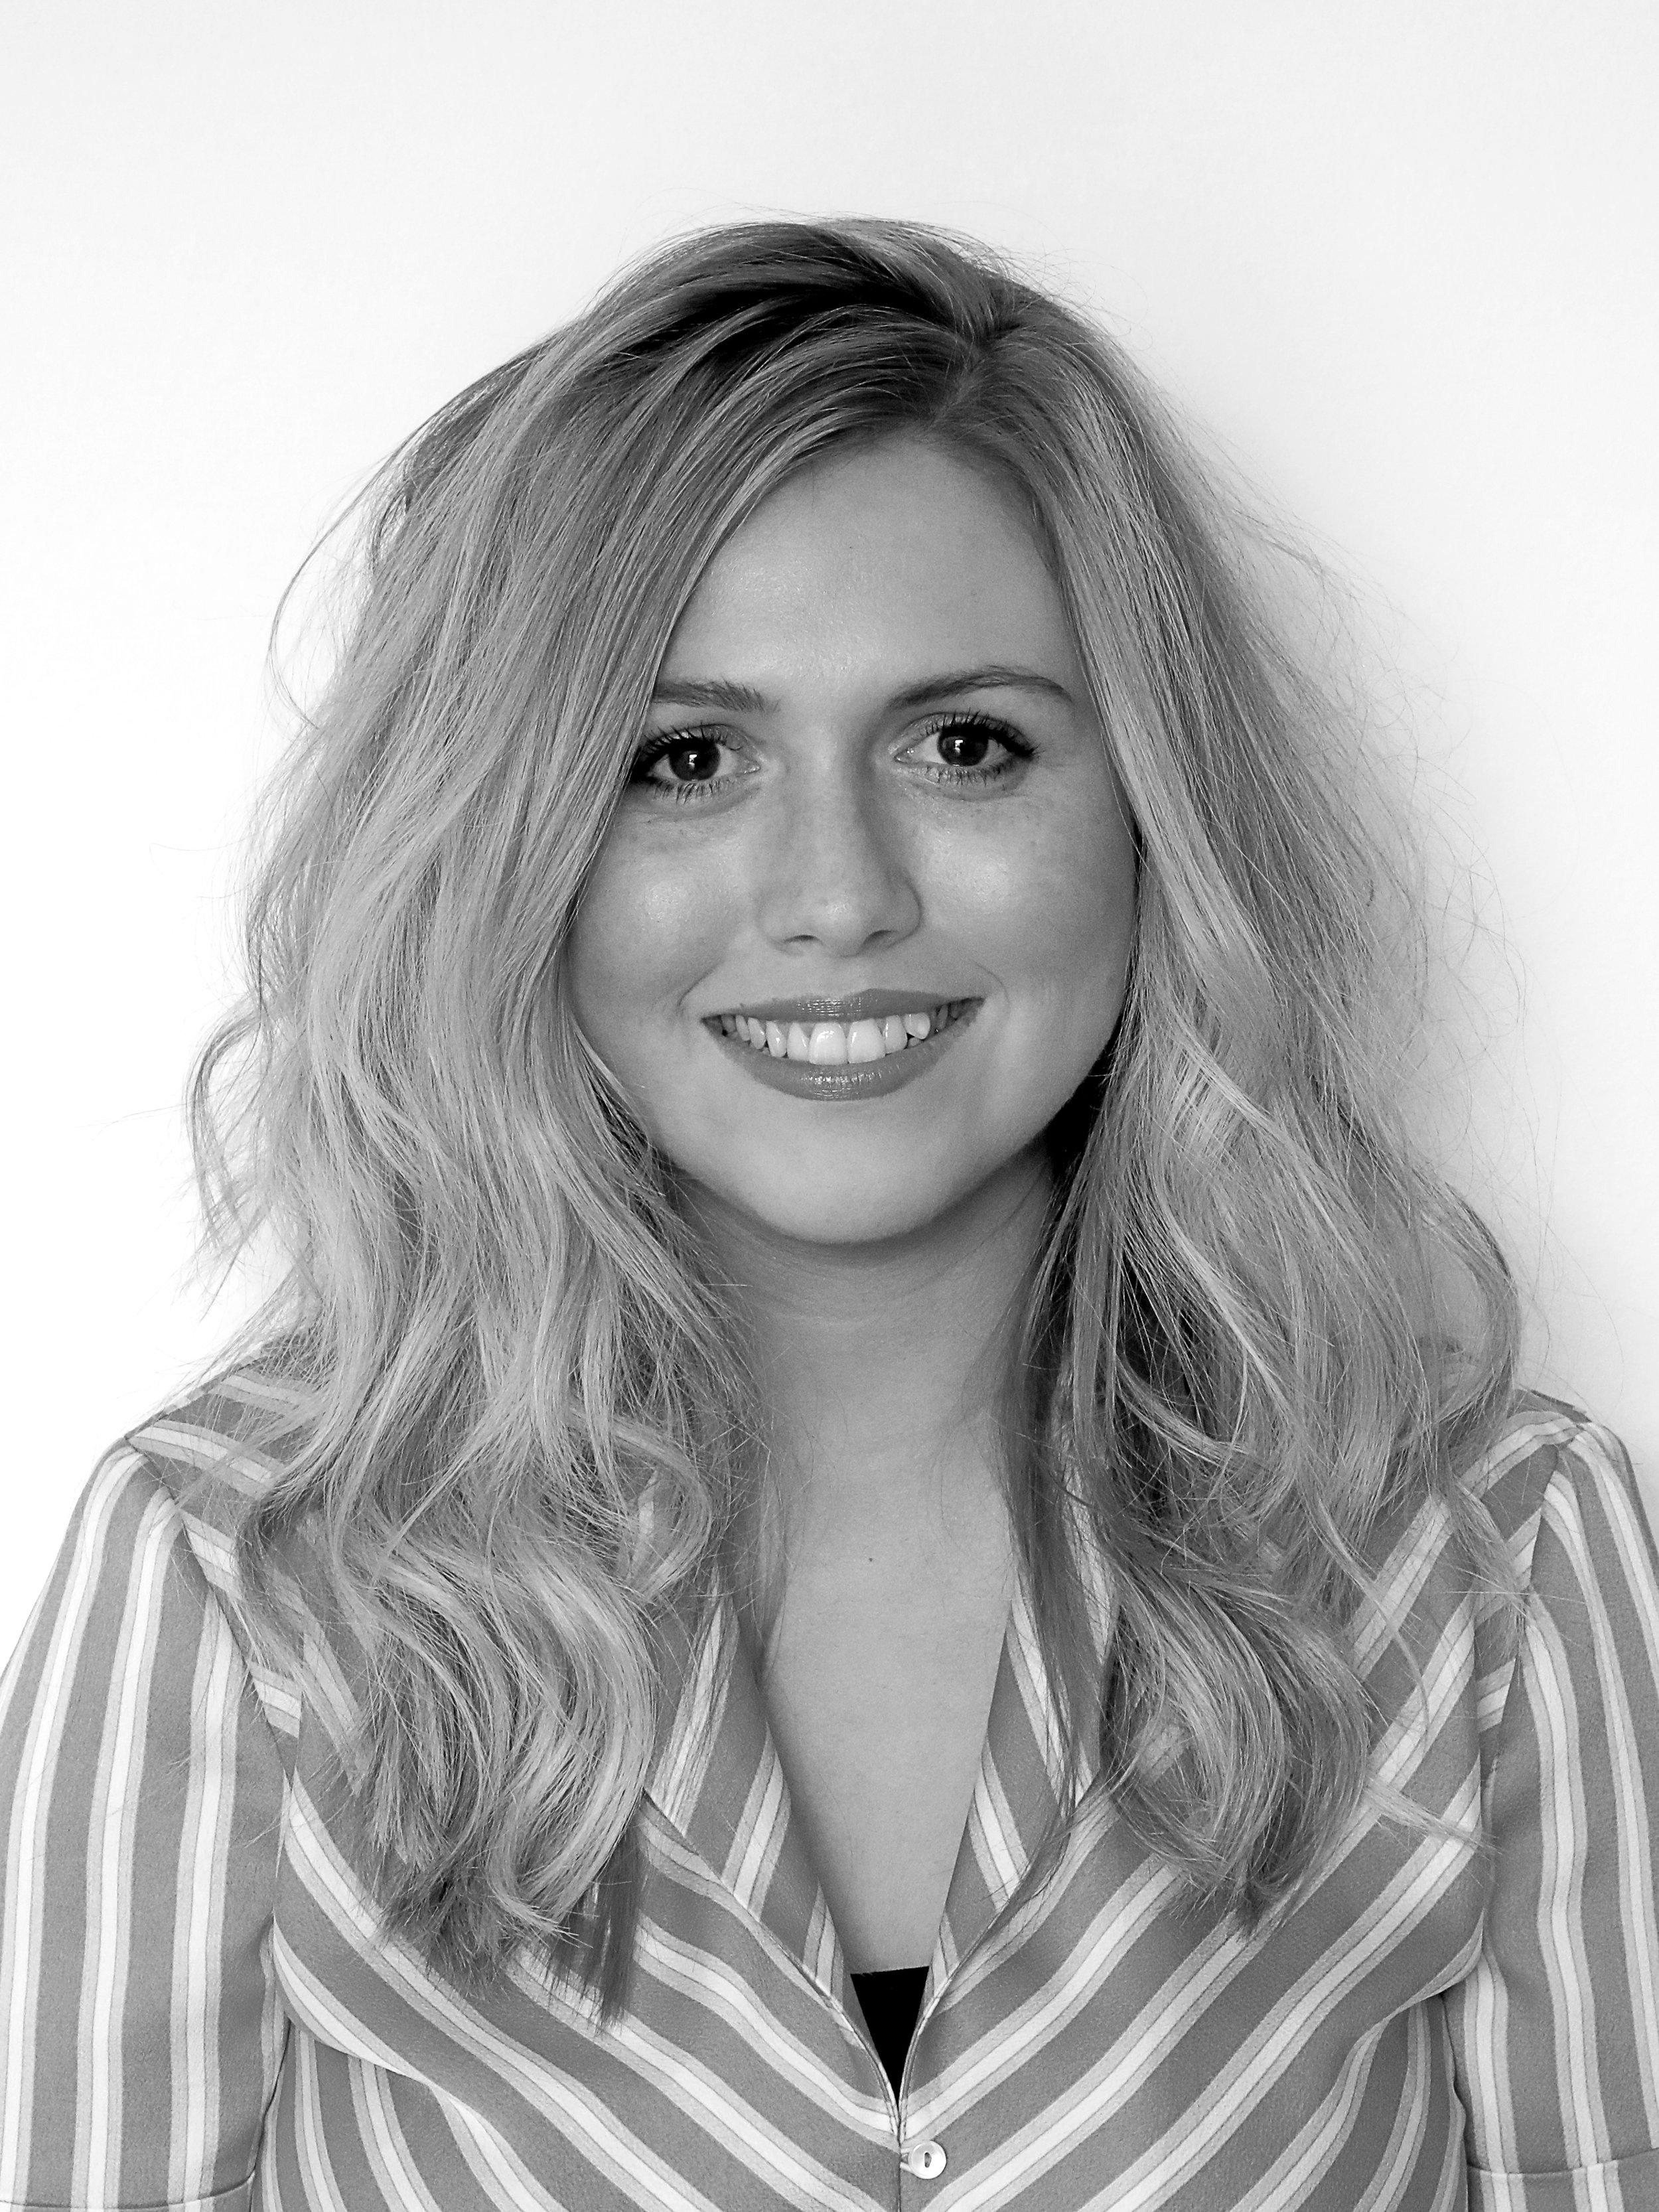 Rachel Hogg